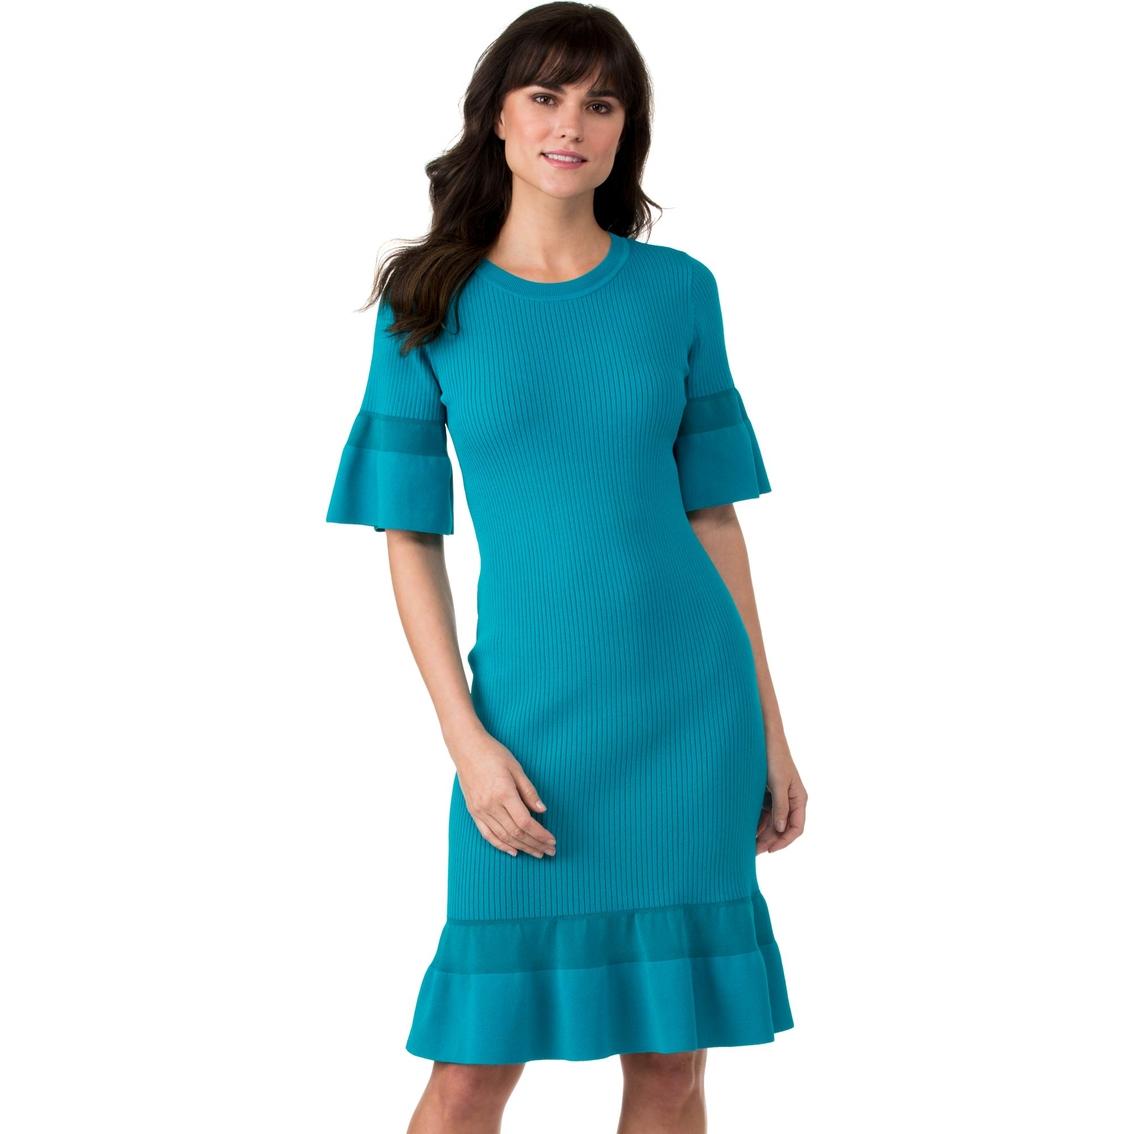 Michael Kors Bodycon Textured Dress   Women\'s   Shop The Exchange